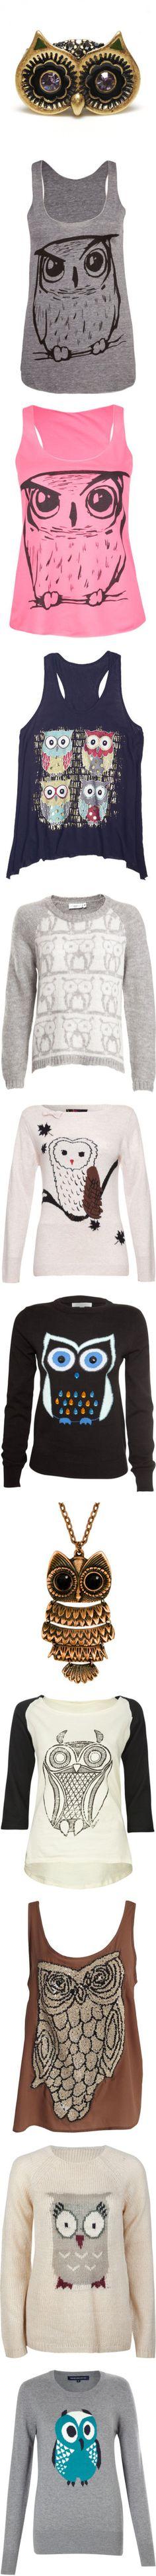 Mejores 2849 imágenes de Owl - Tela/Fieltro en Pinterest | Owl ...